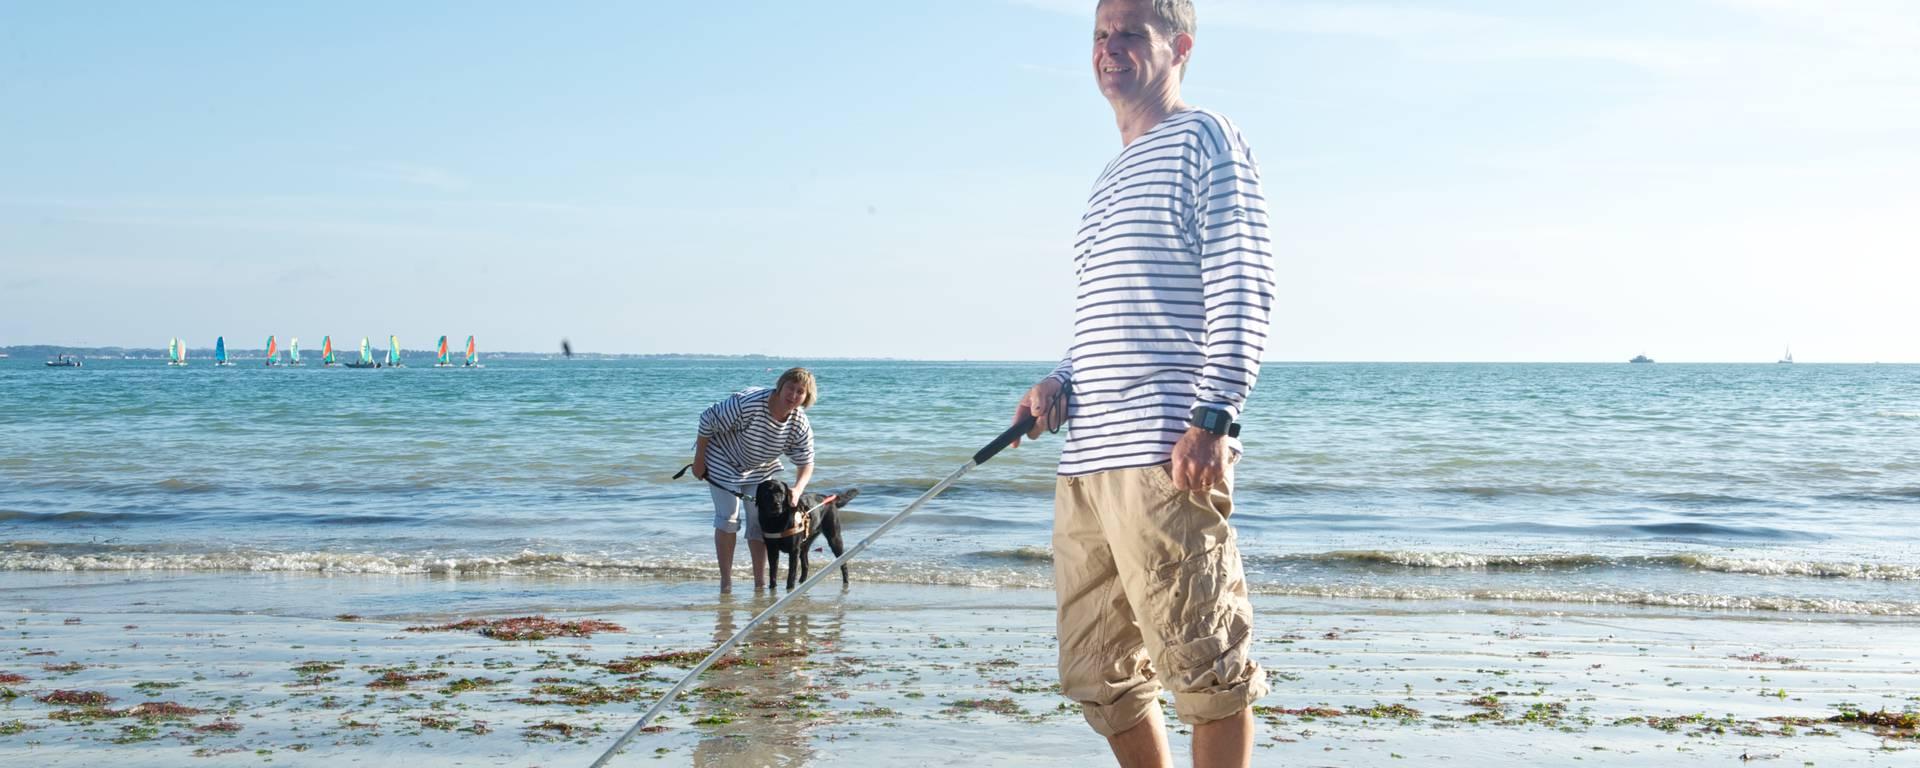 Balades sur la plage ©Diaphane/EllProd